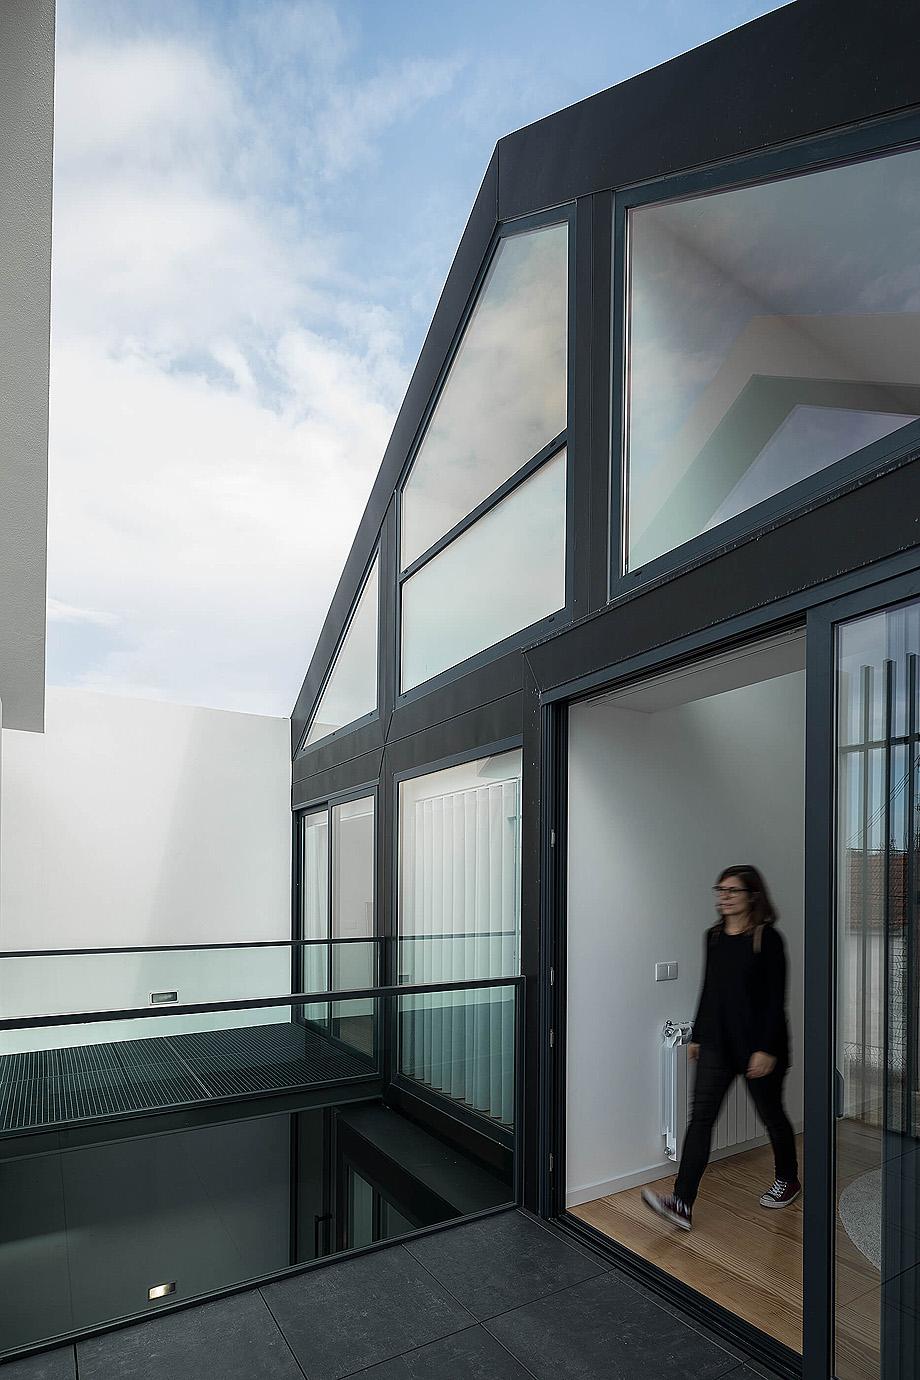 casa do arco de frari architecture network - foto ivo tavares (22)